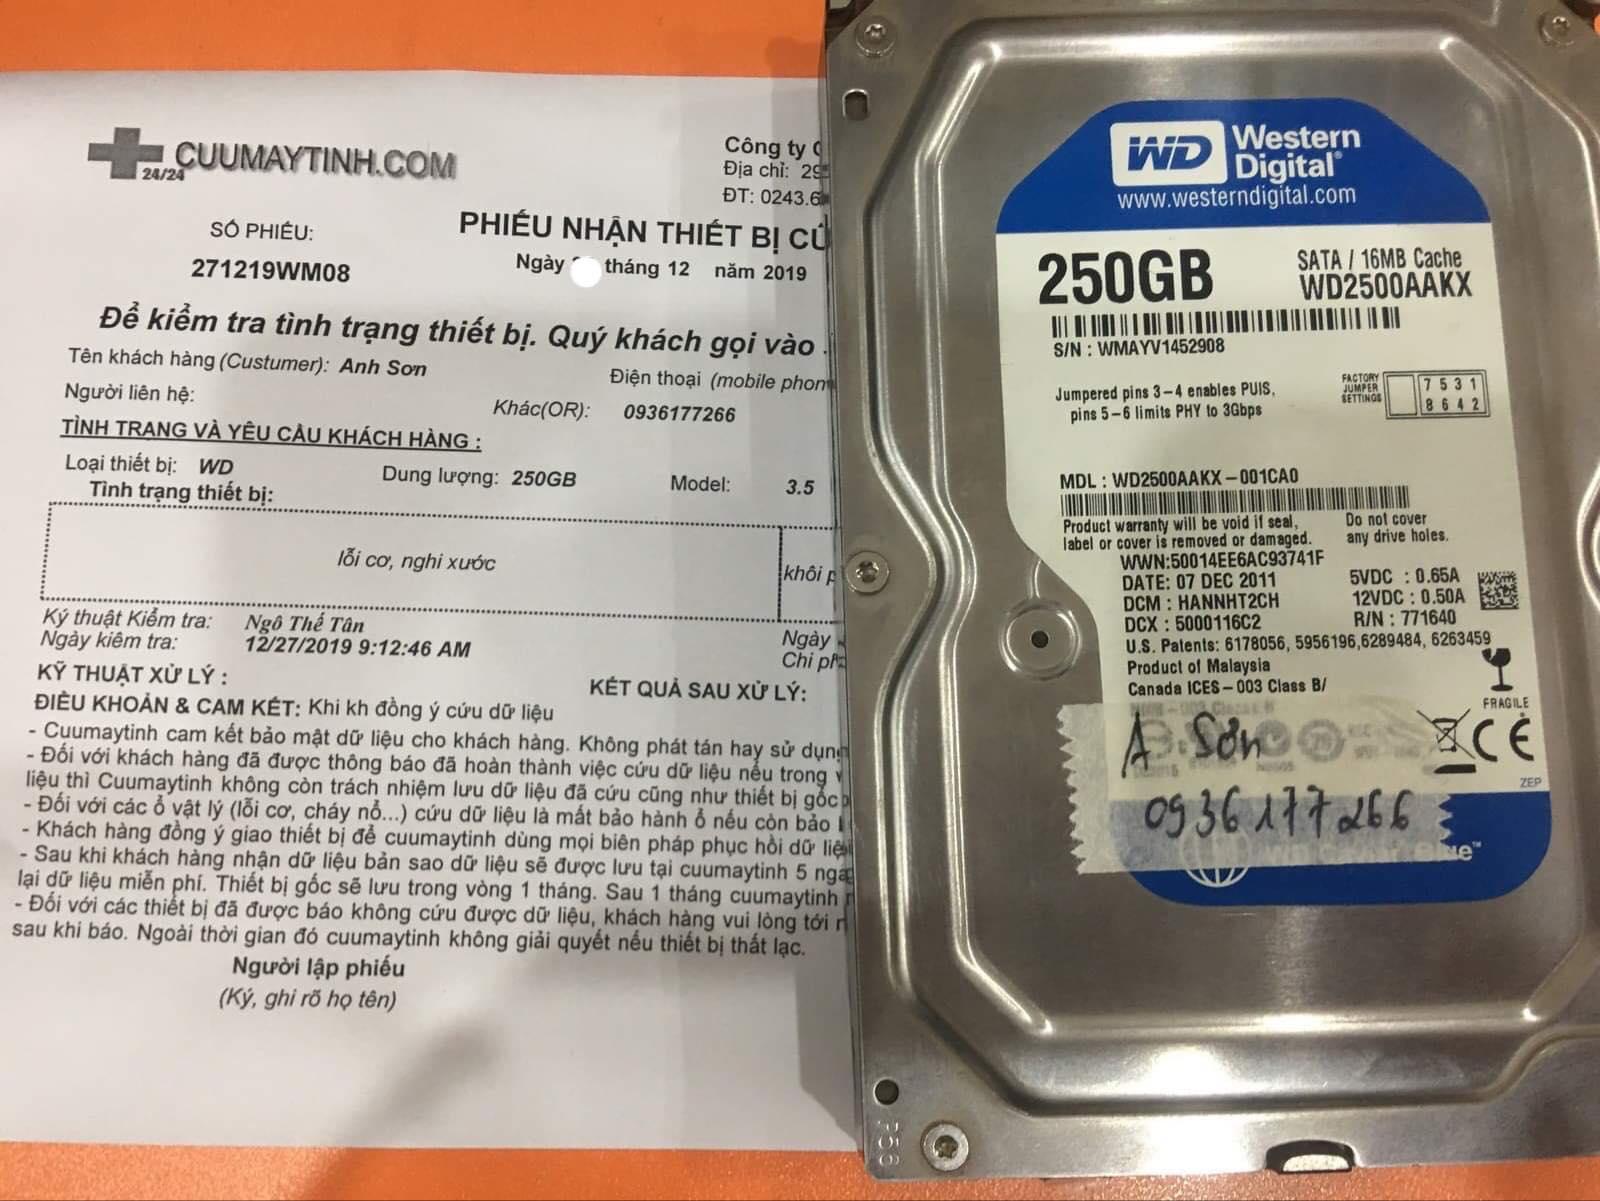 Khôi phục dữ liệu ổ cứng Western 250GB lỗi cơ 31/12/2019 - cuumaytinh